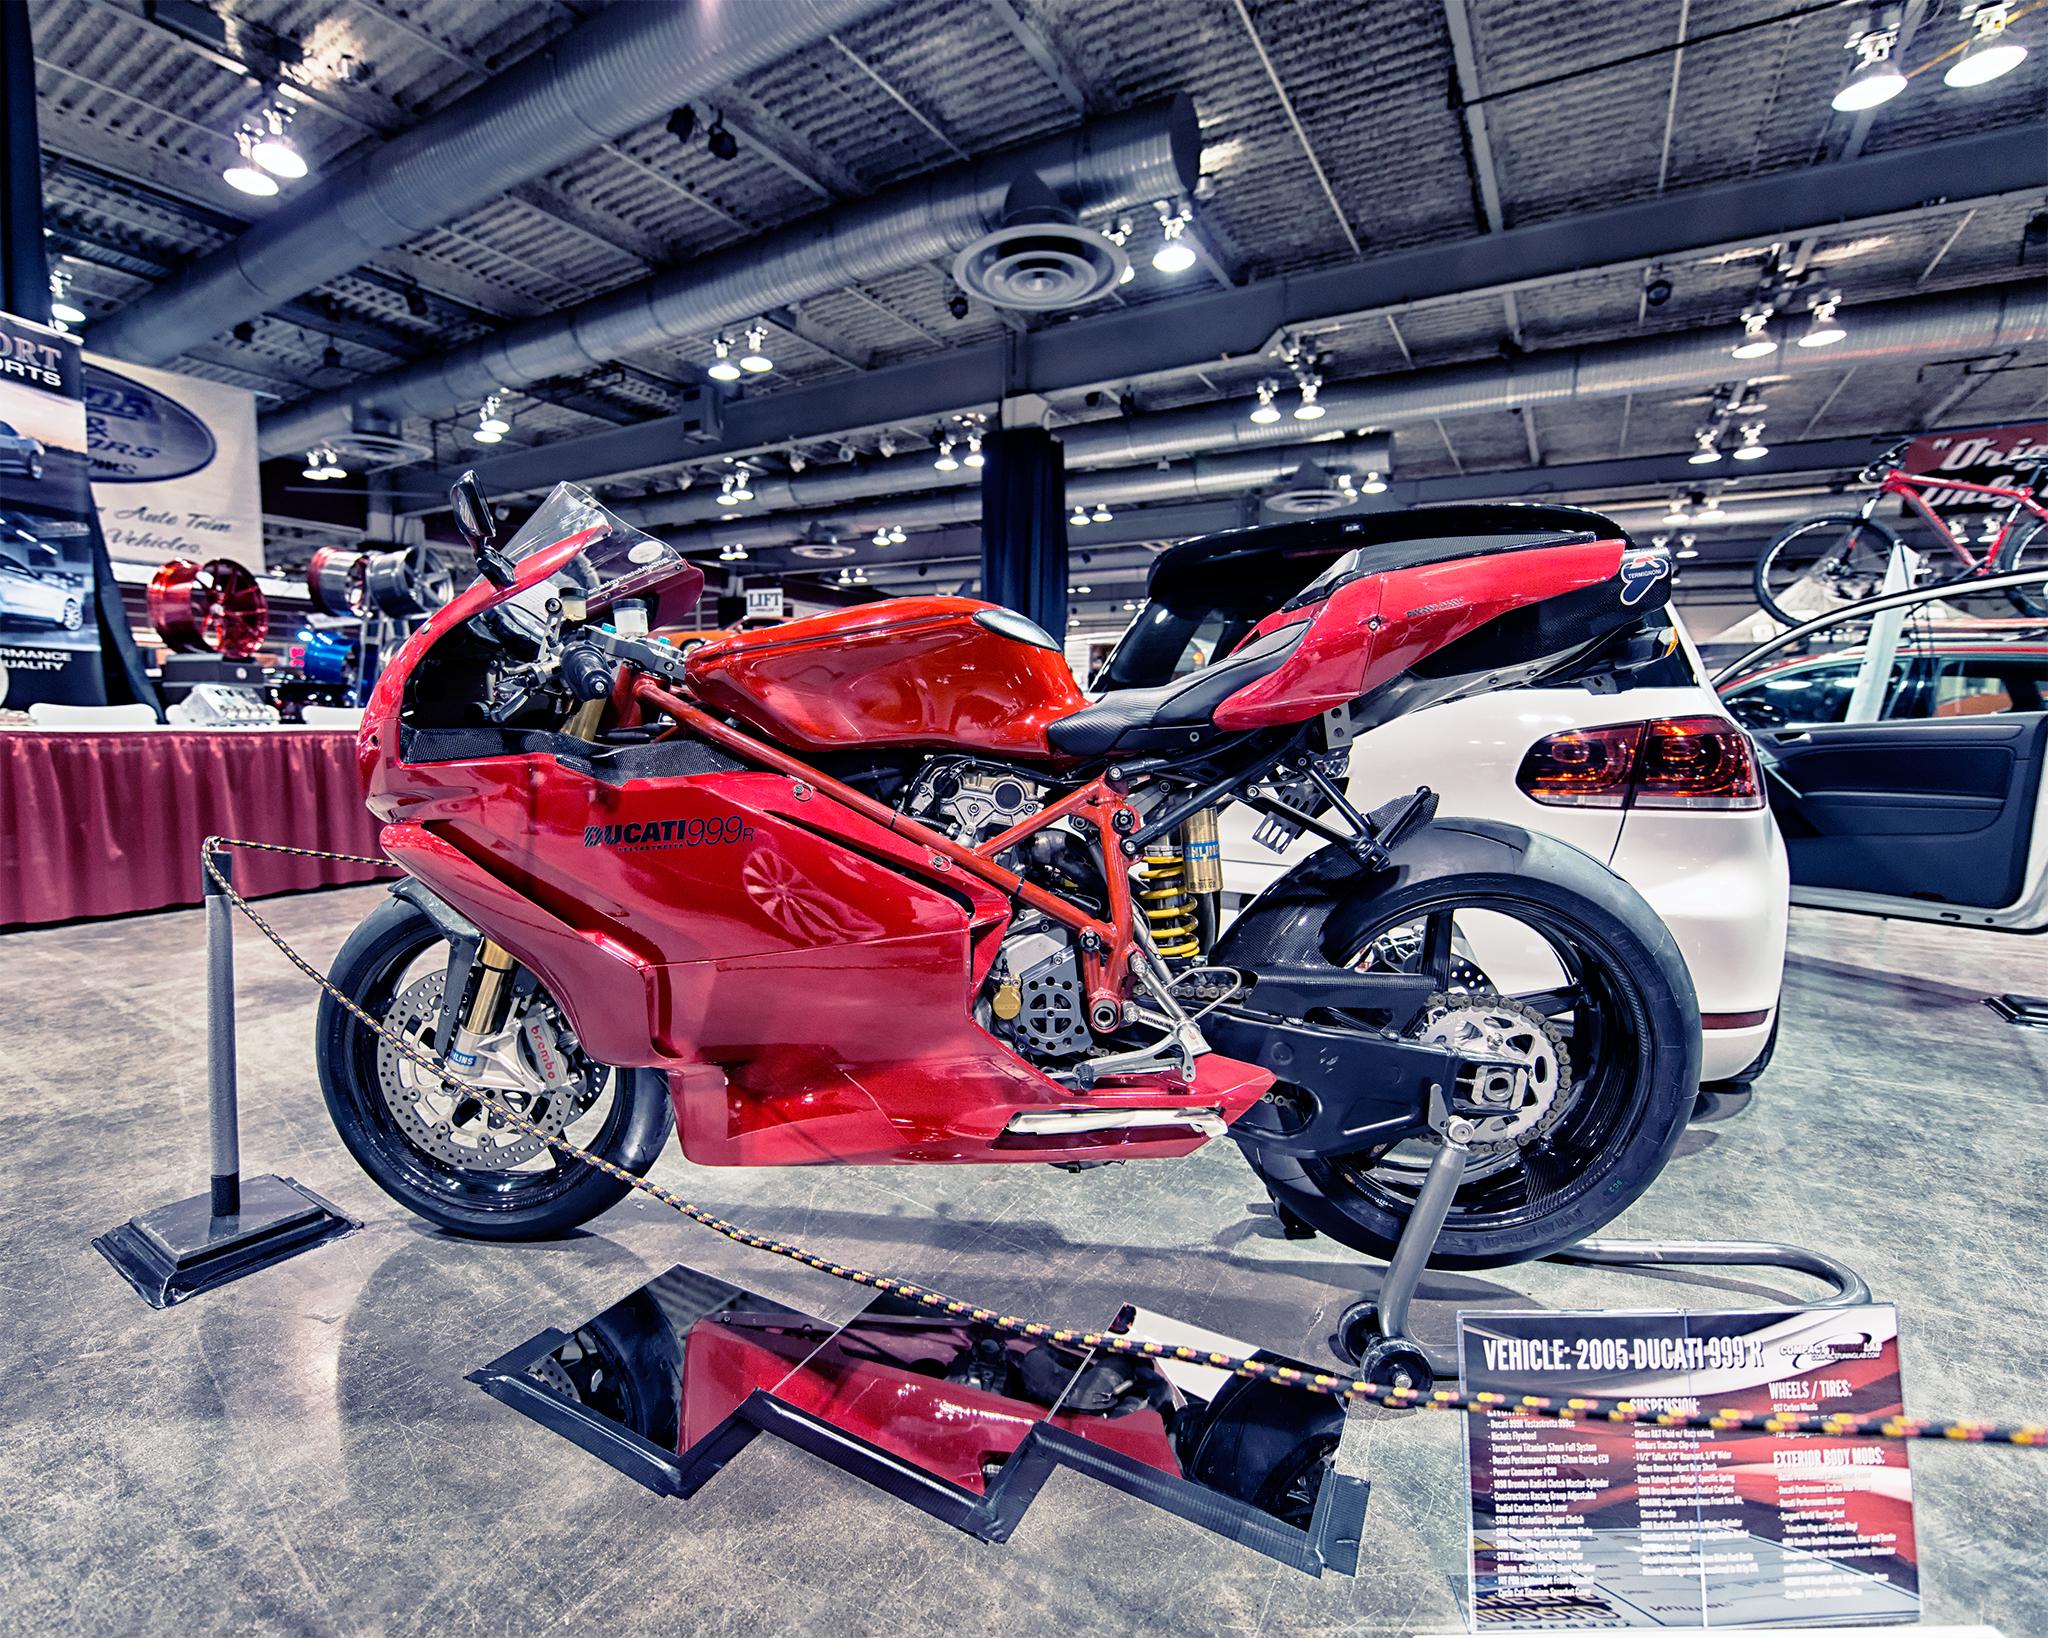 Ducatti.jpg